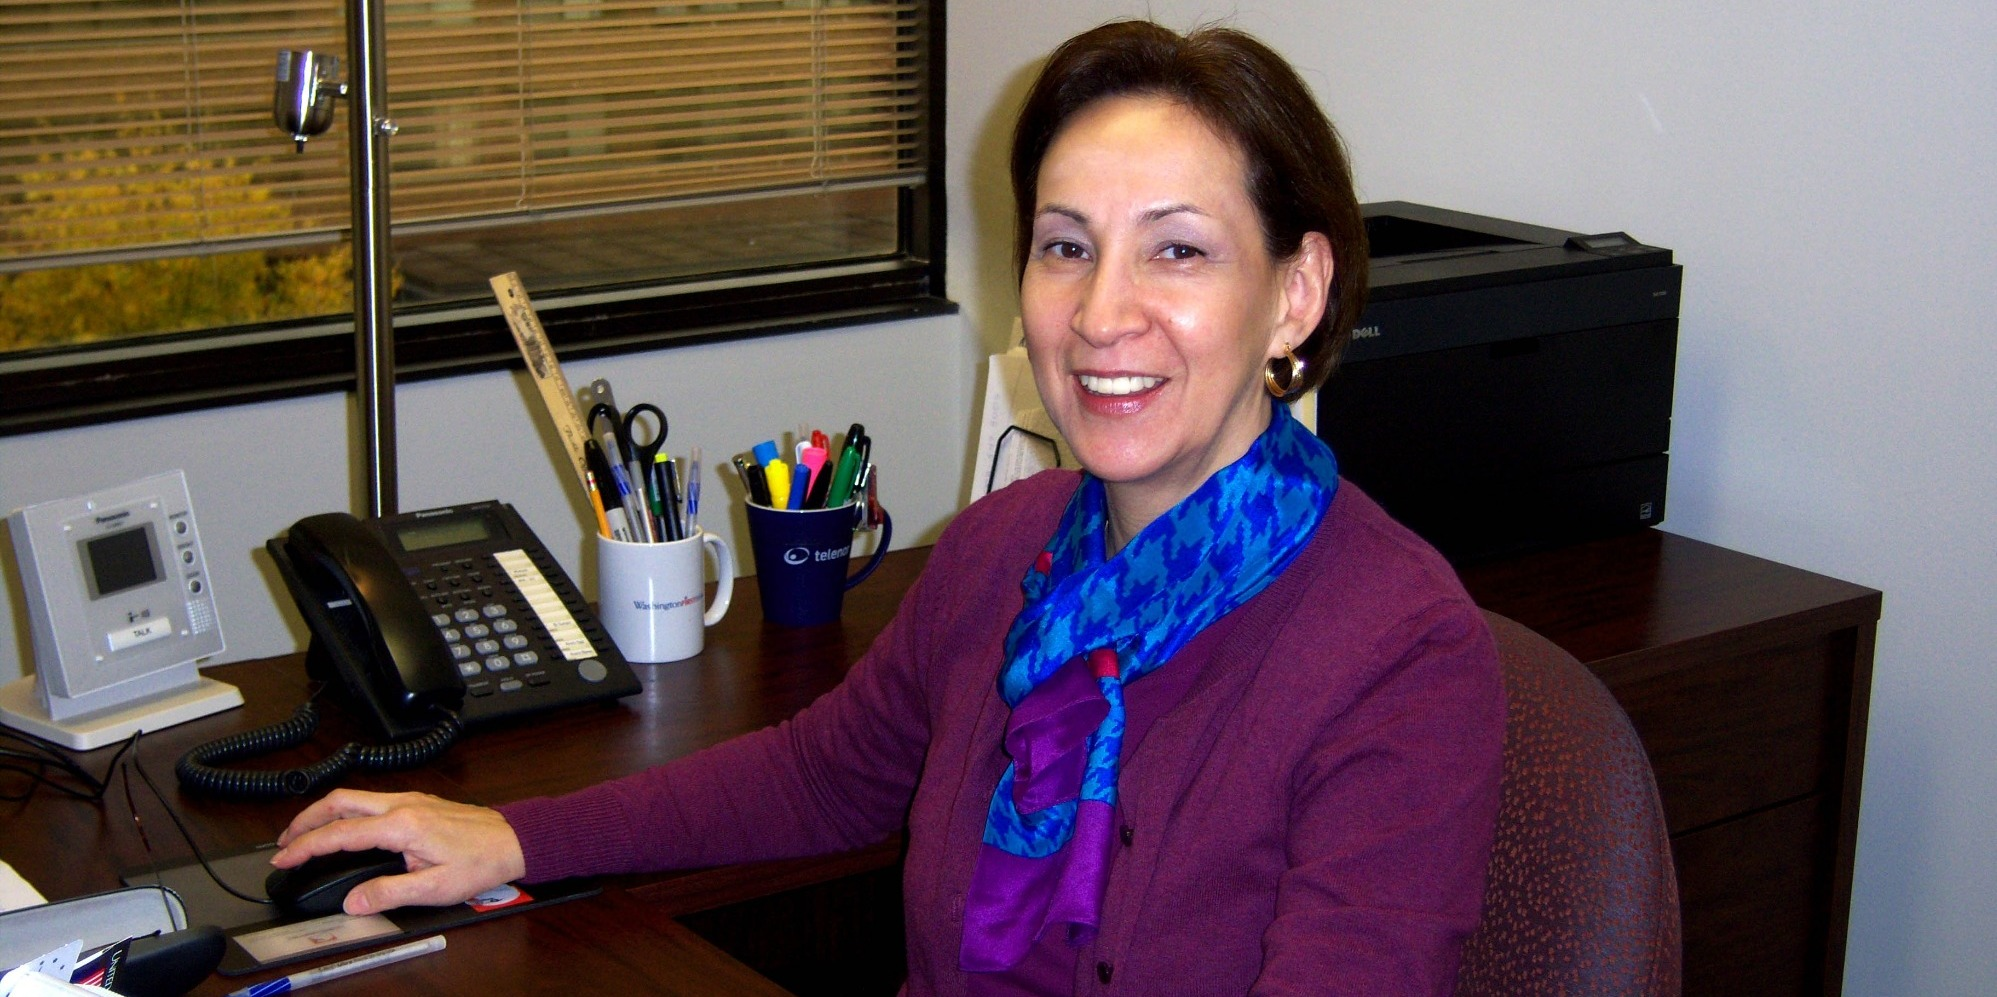 HelenaFalla com, HelenaFalla com is a business consultancy